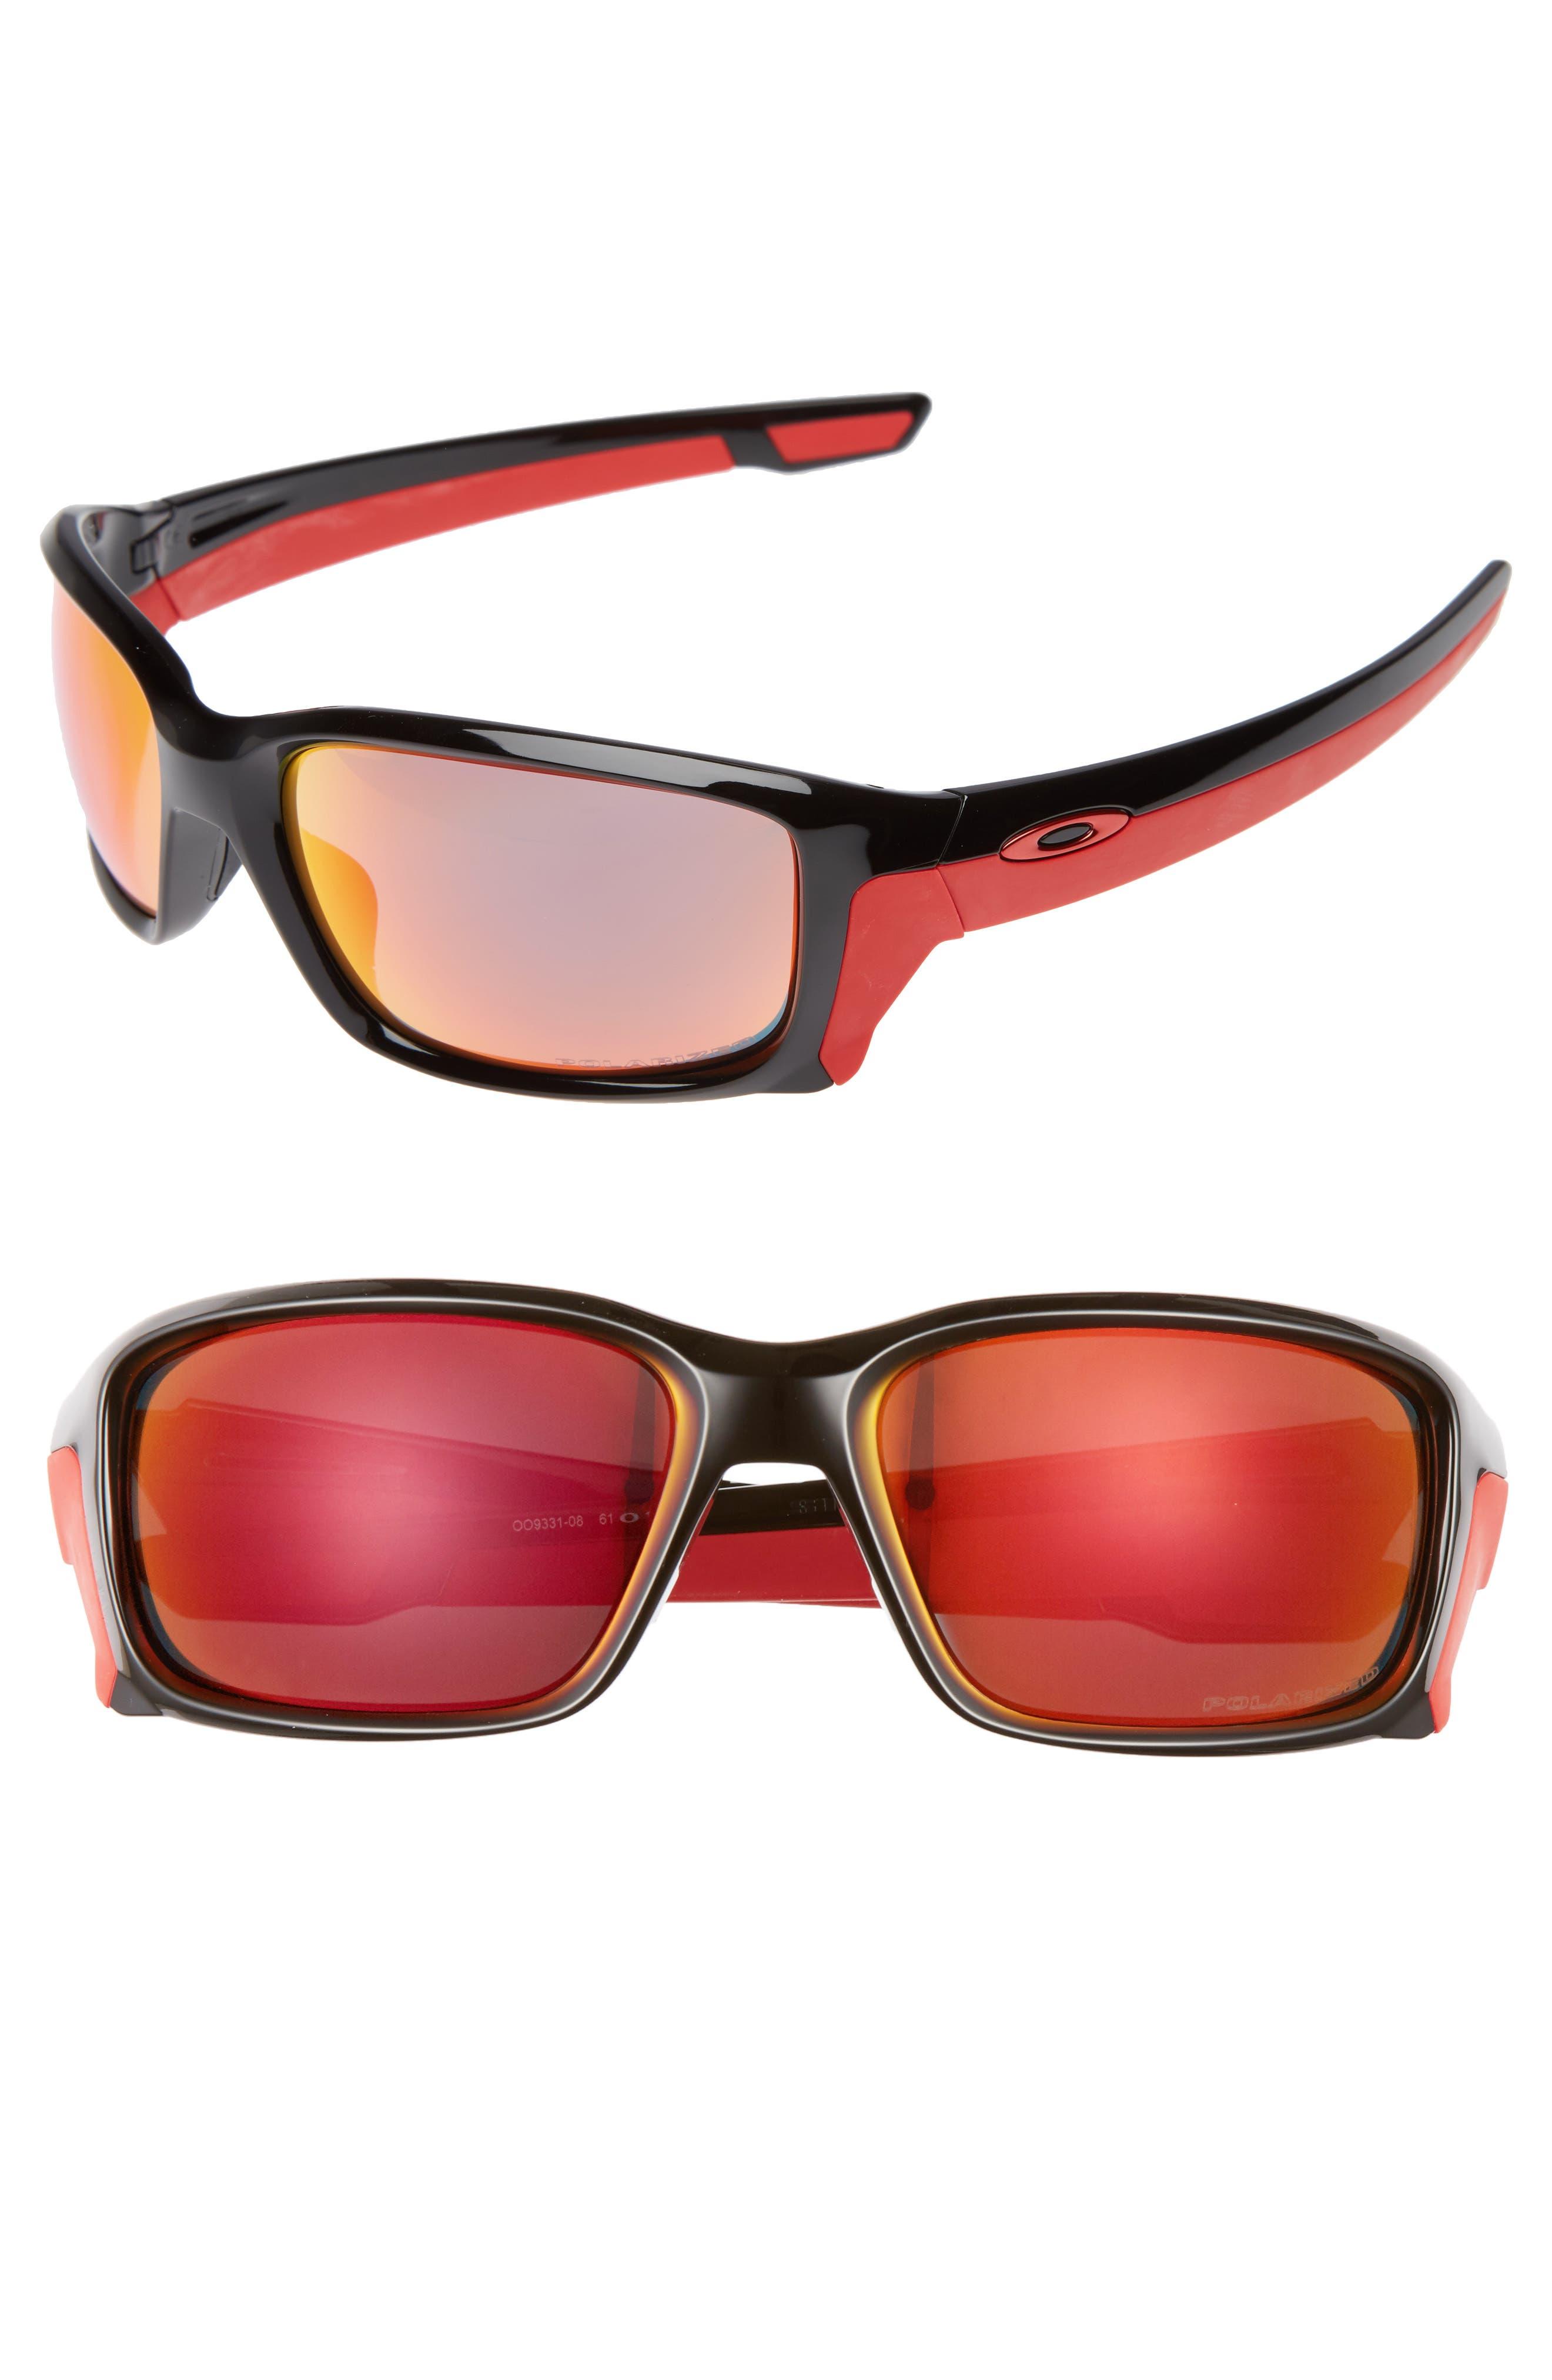 Straightlink 61mm Polarized Sunglasses,                             Main thumbnail 1, color,                             001